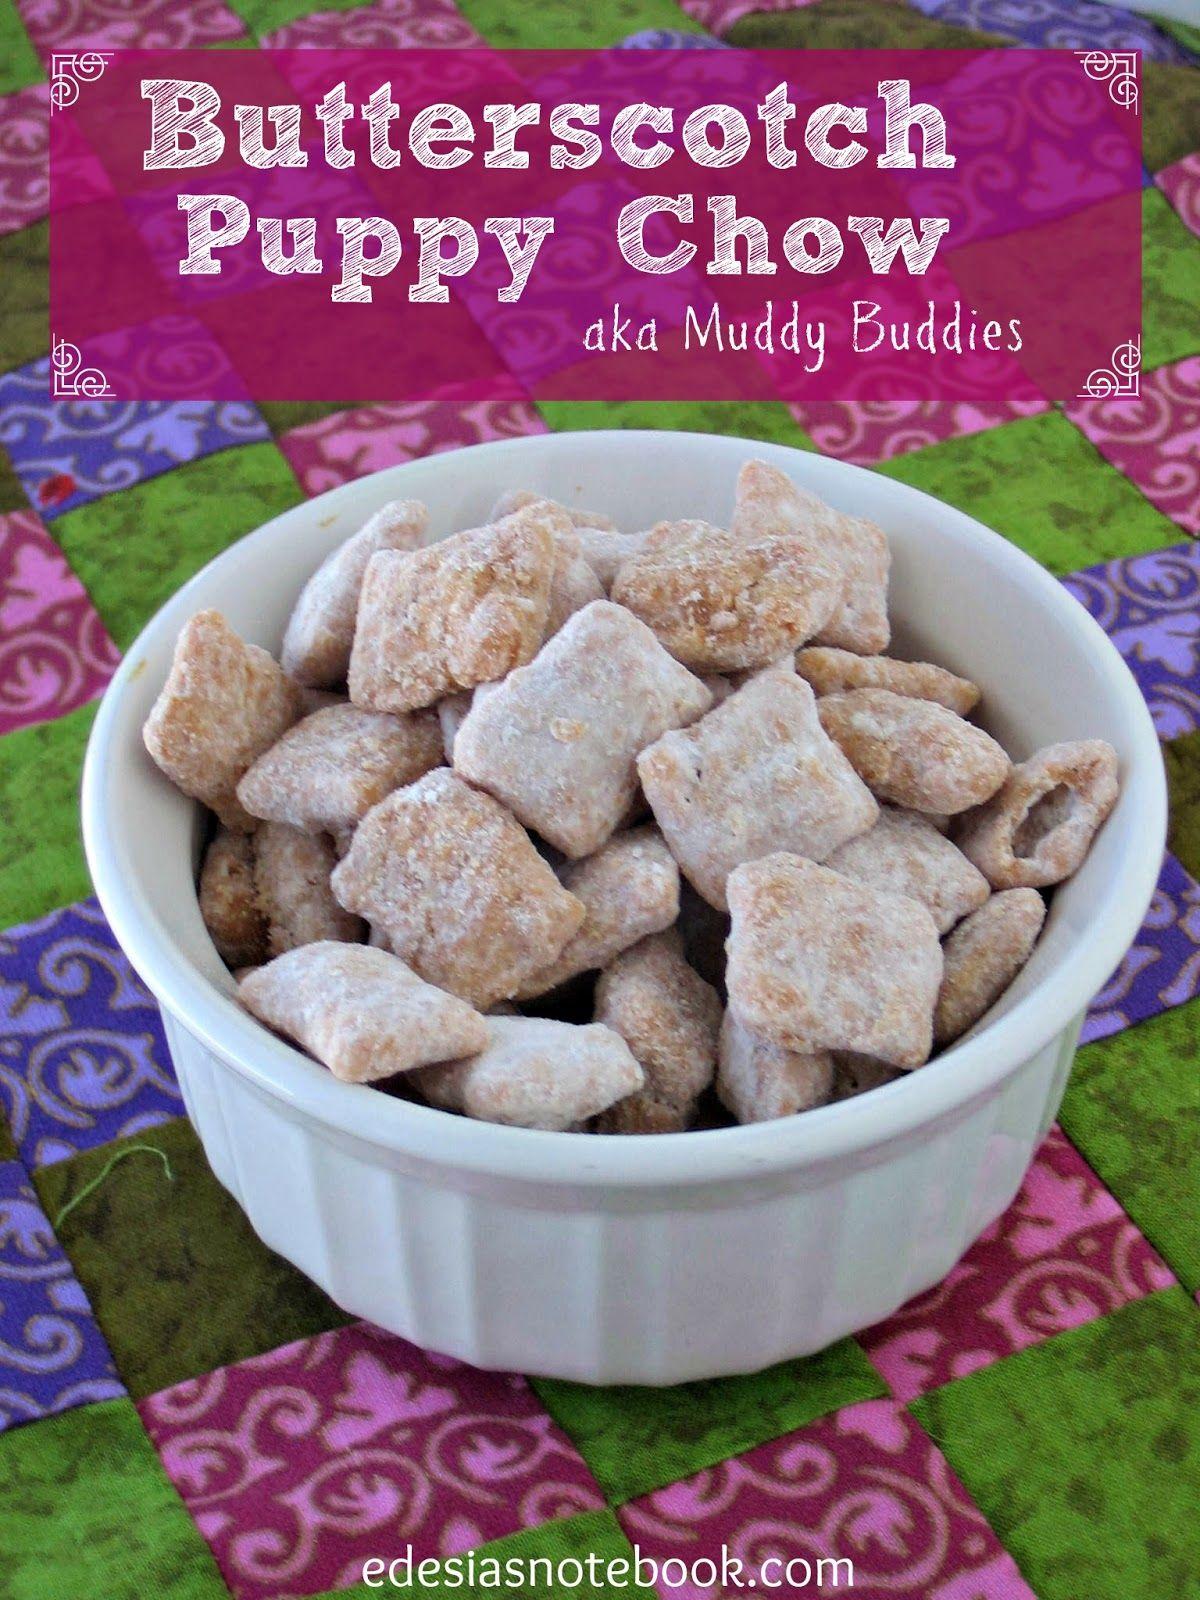 Butterscotch Puppy Chow (Muddy Buddies) Puppy chow